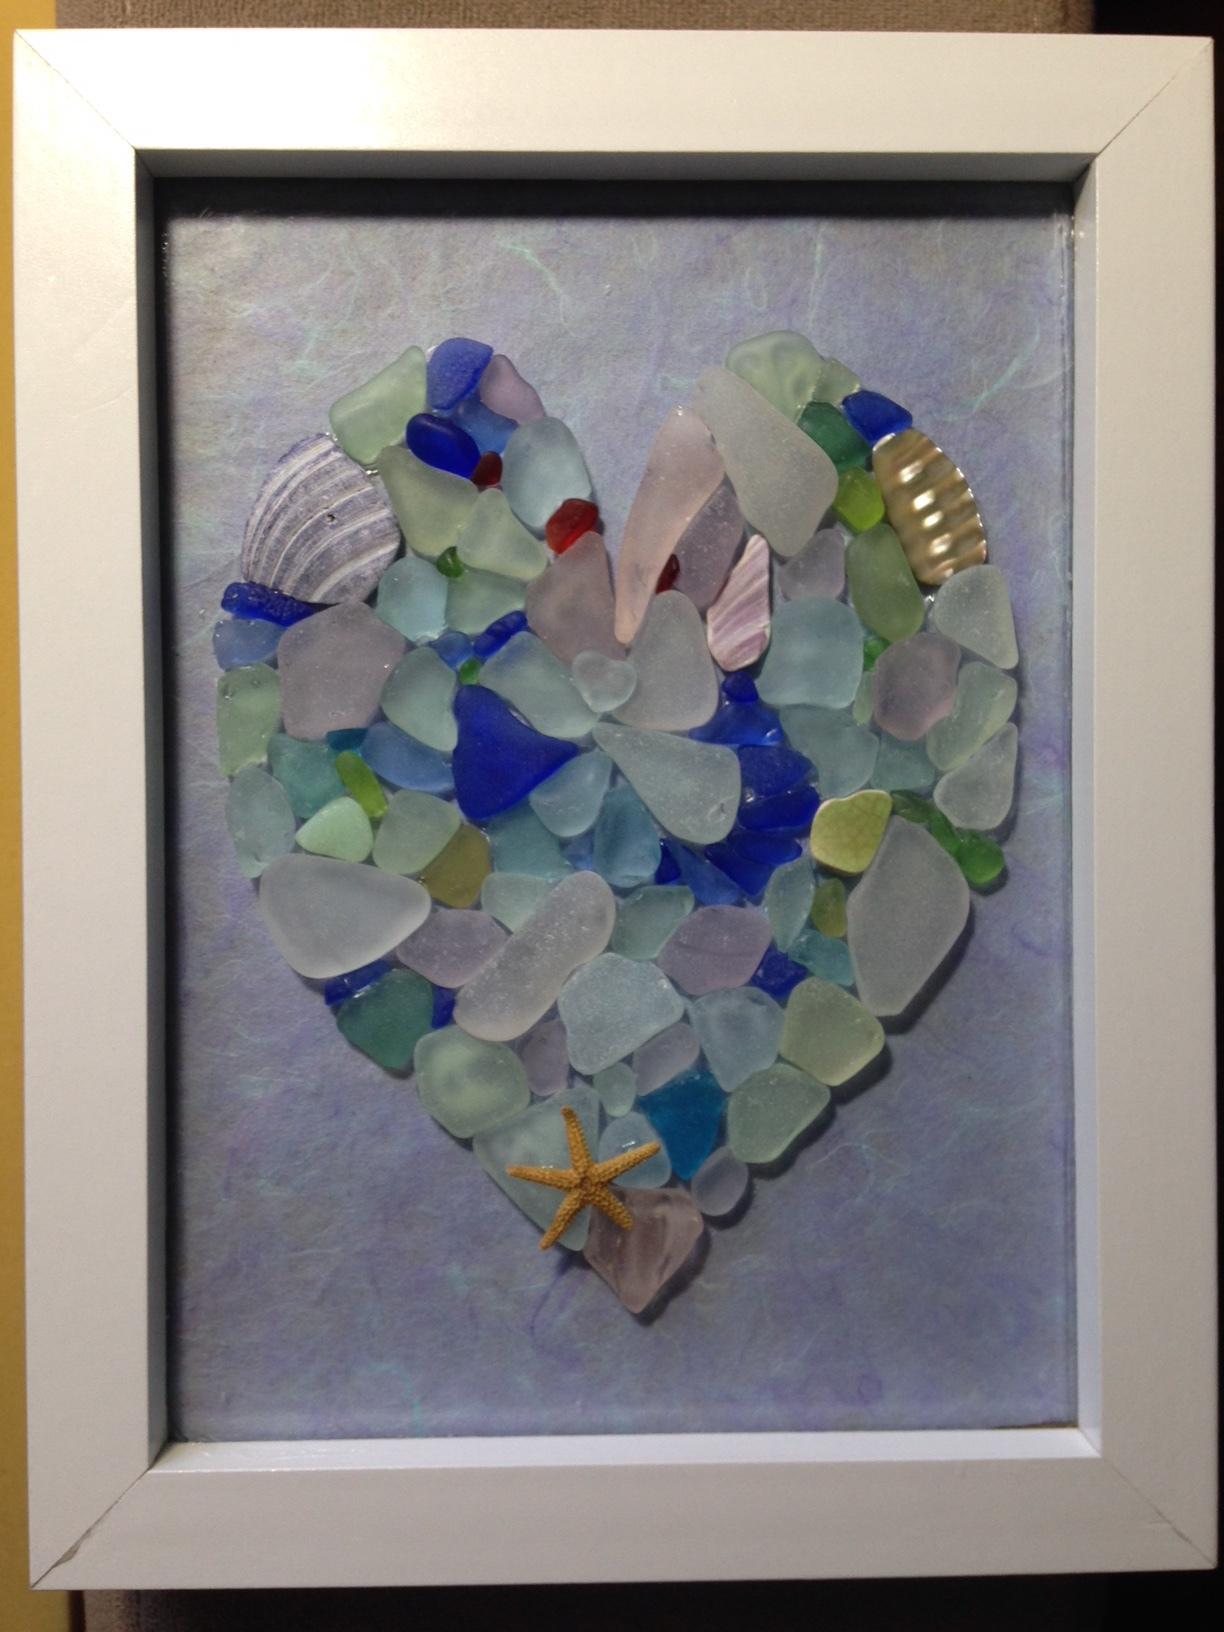 Seaglass Heart